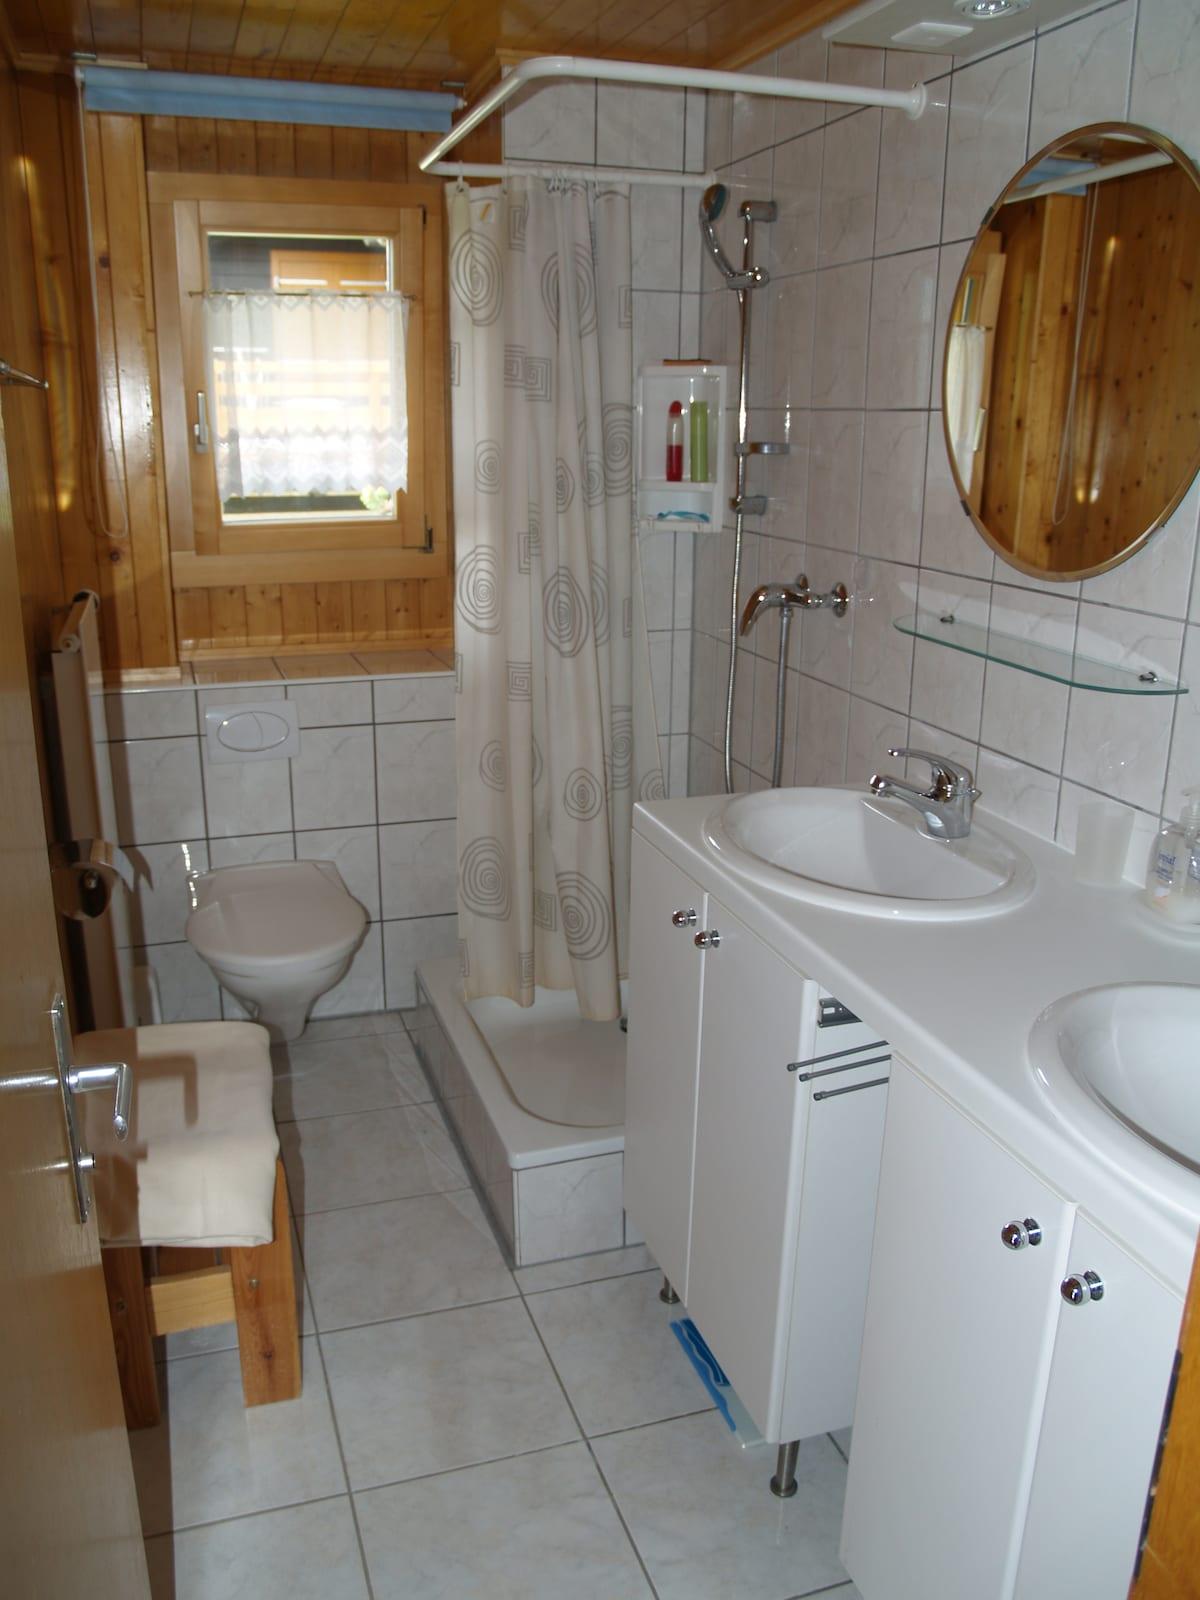 Bathroom on lower floor with shower